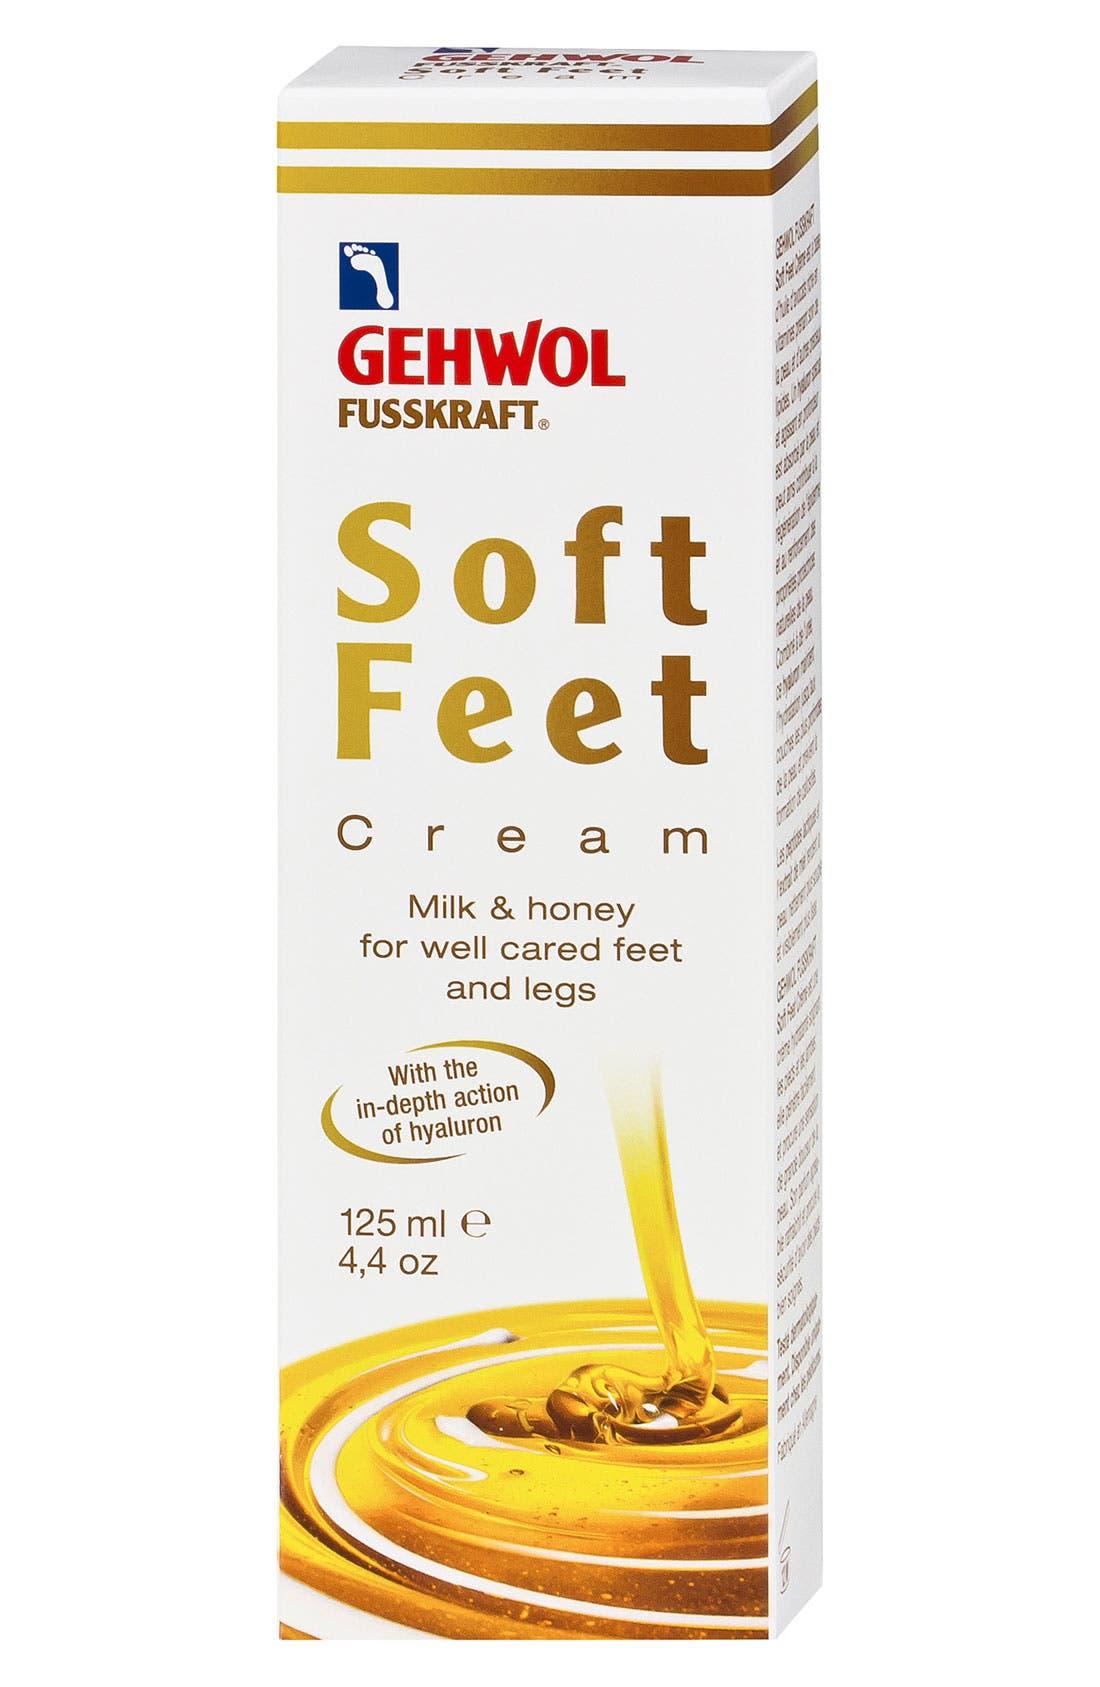 GEHWOL,  Foot Care 'Soft Feet' Cream, Alternate thumbnail 2, color, NO COLOR